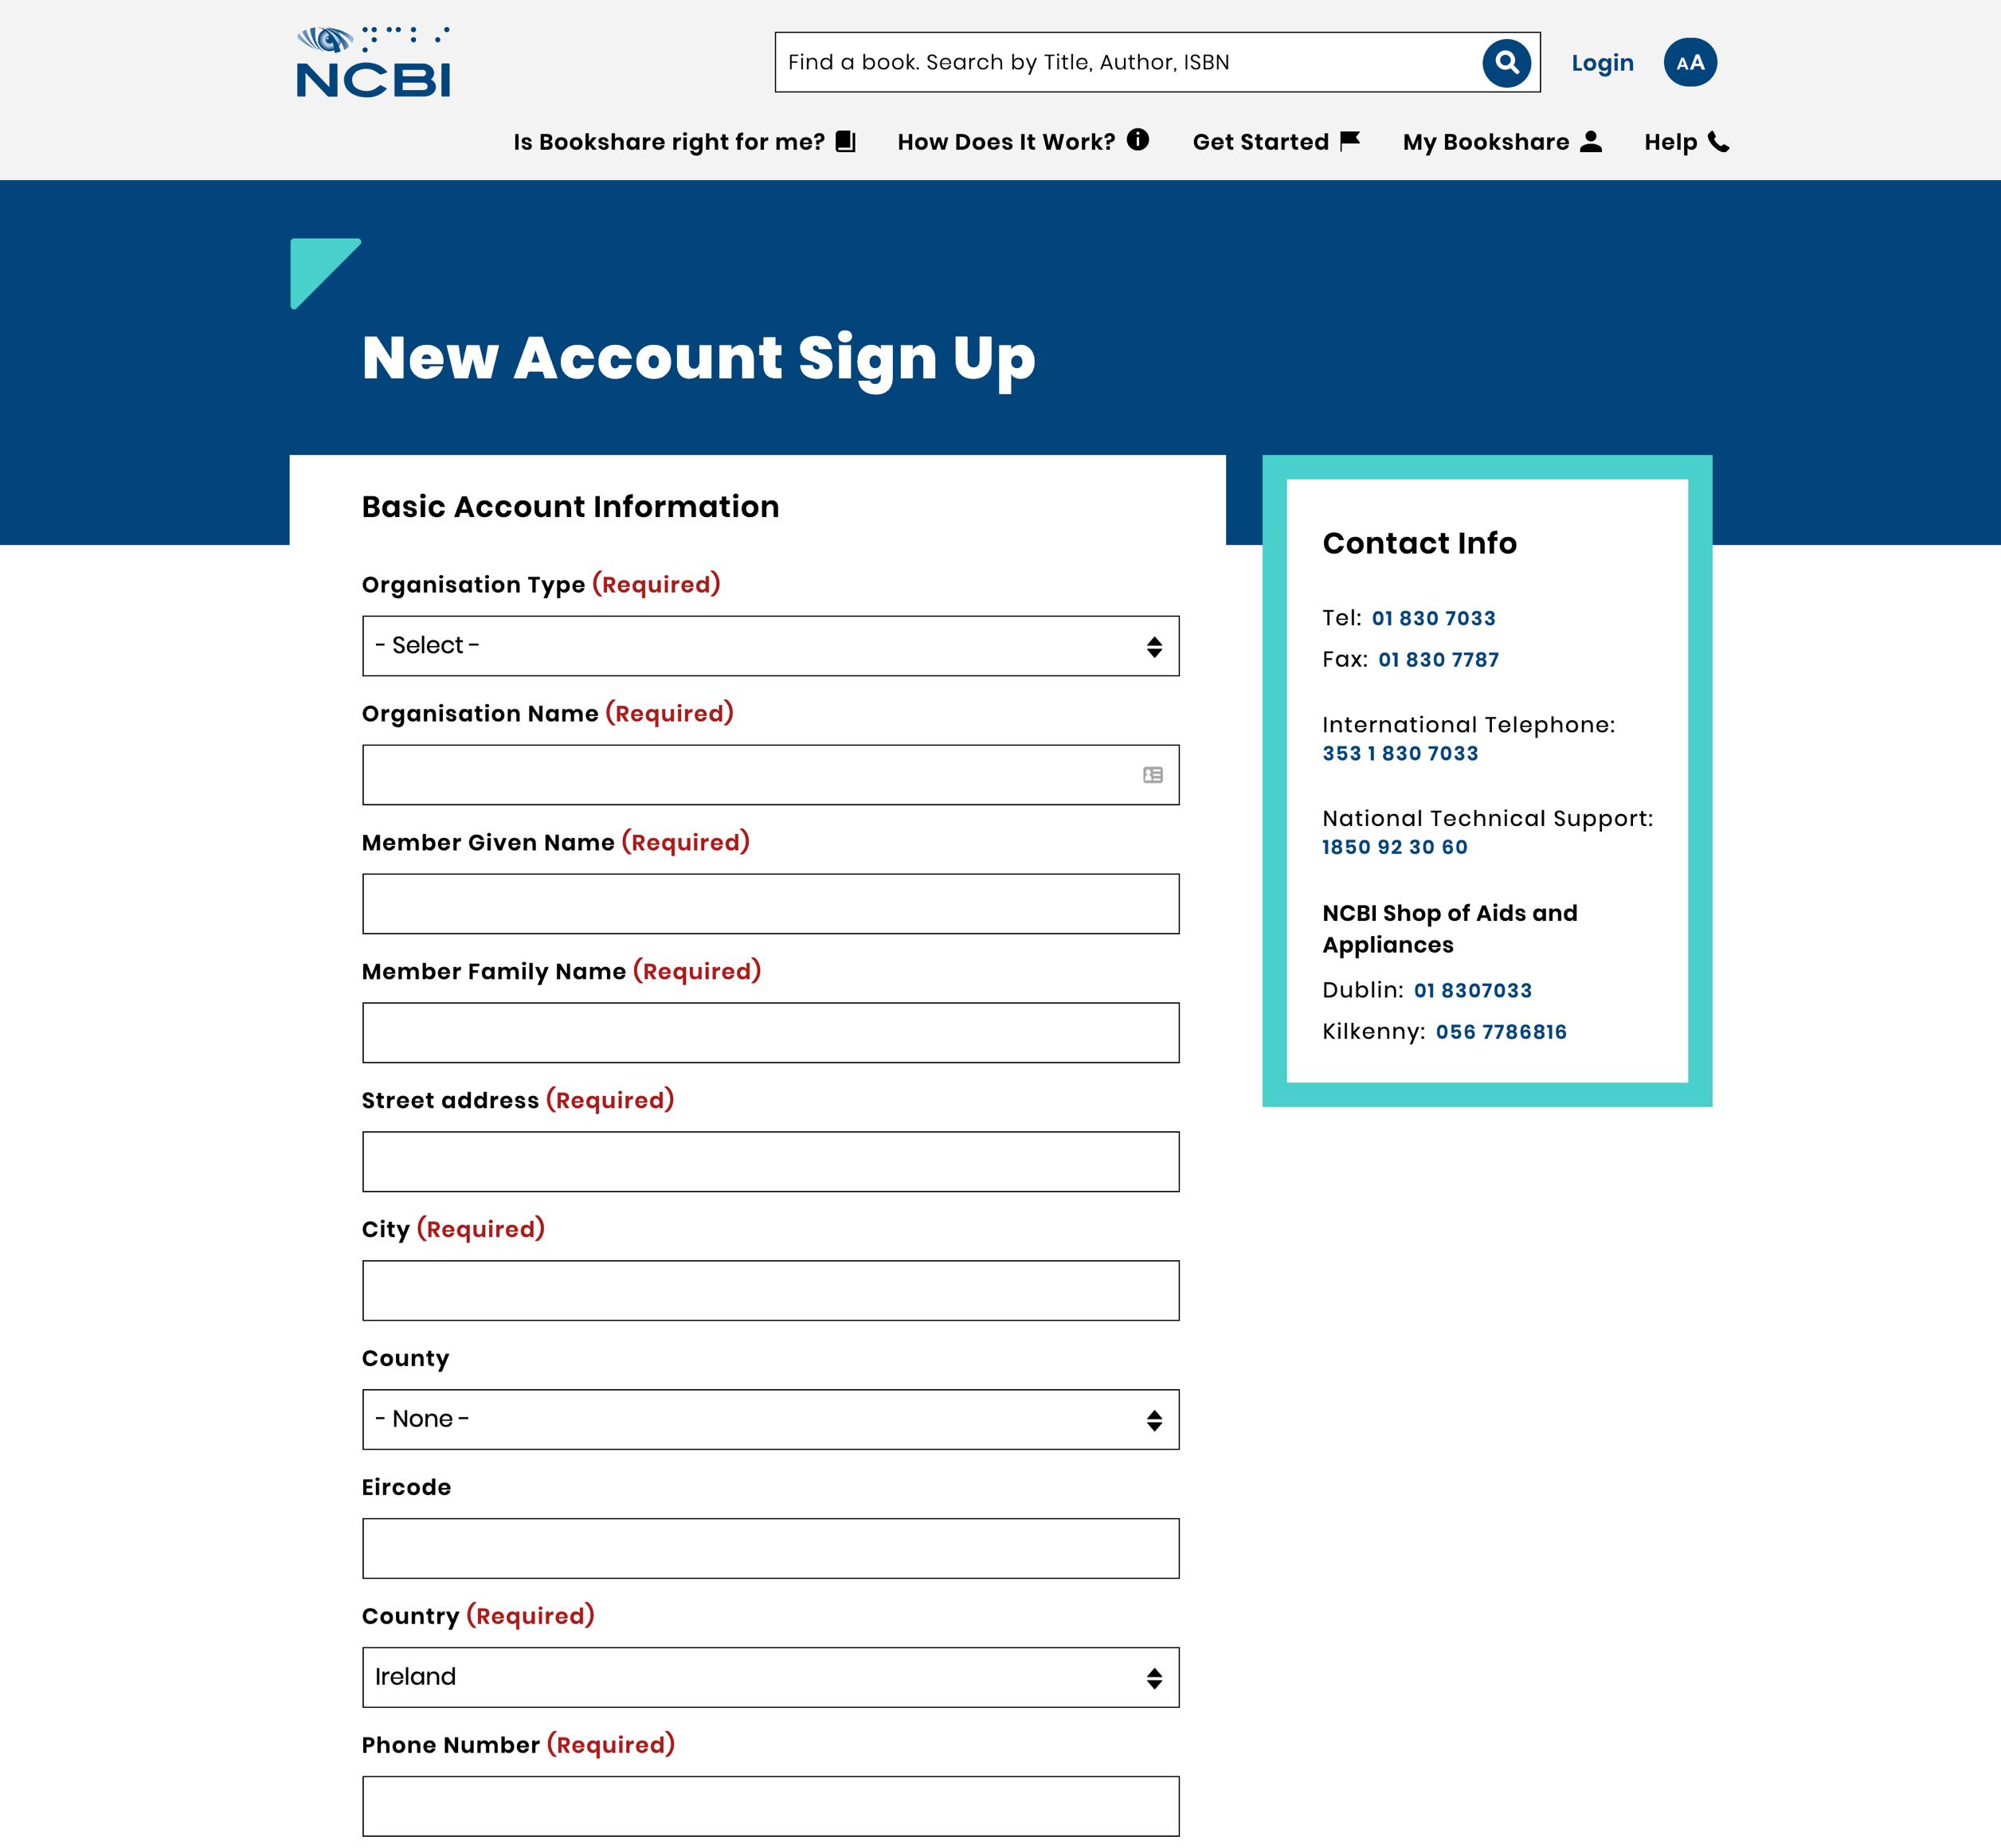 Bookshare new account form layout.